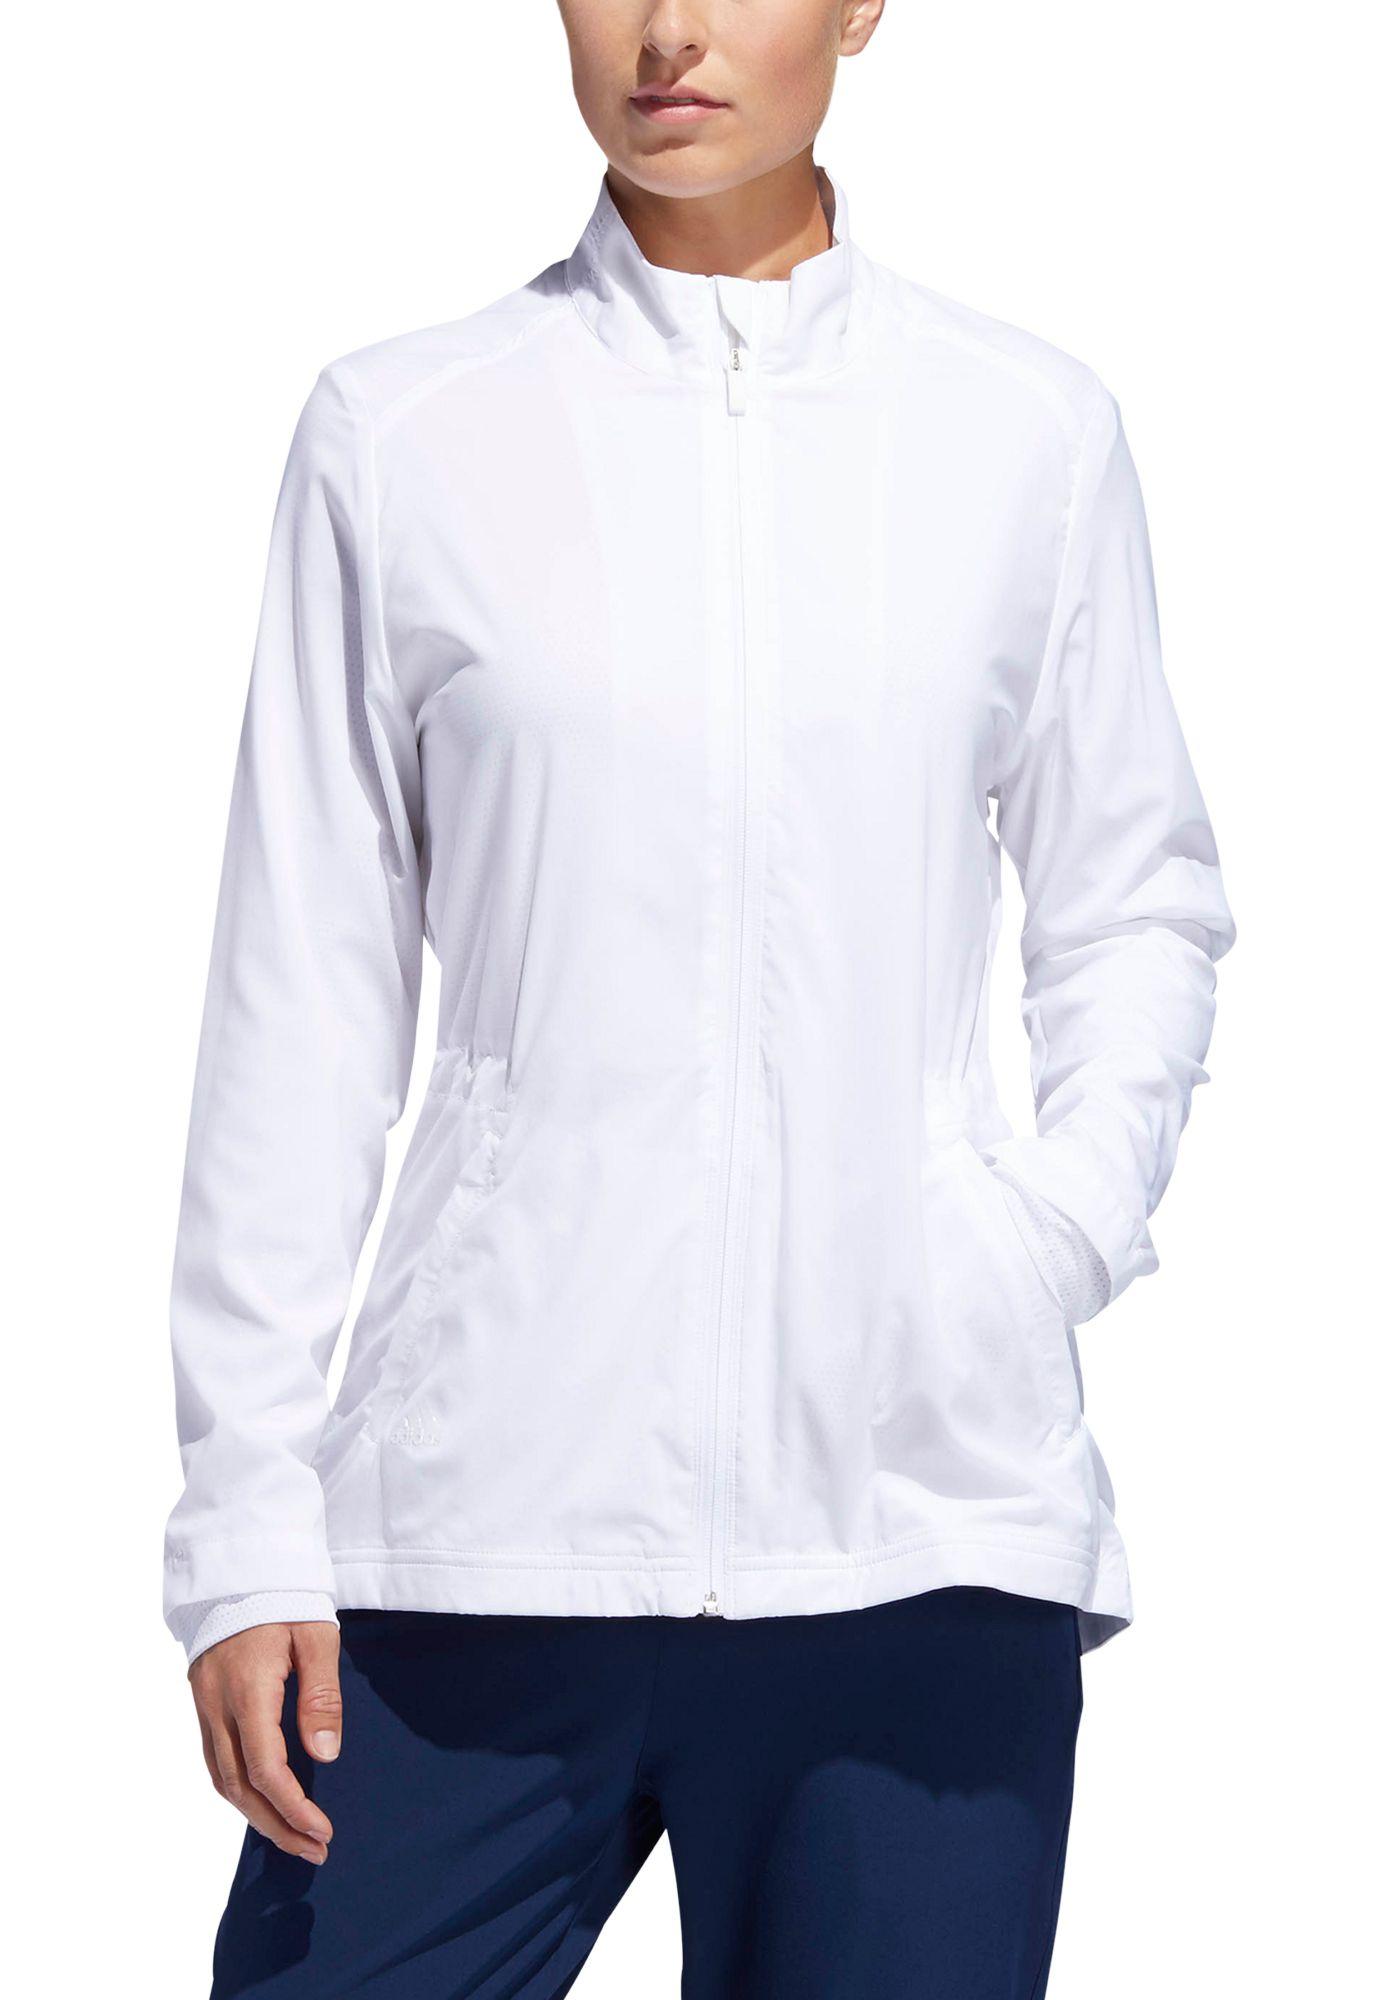 adidas Women's Sport Full Zip Golf Jacket